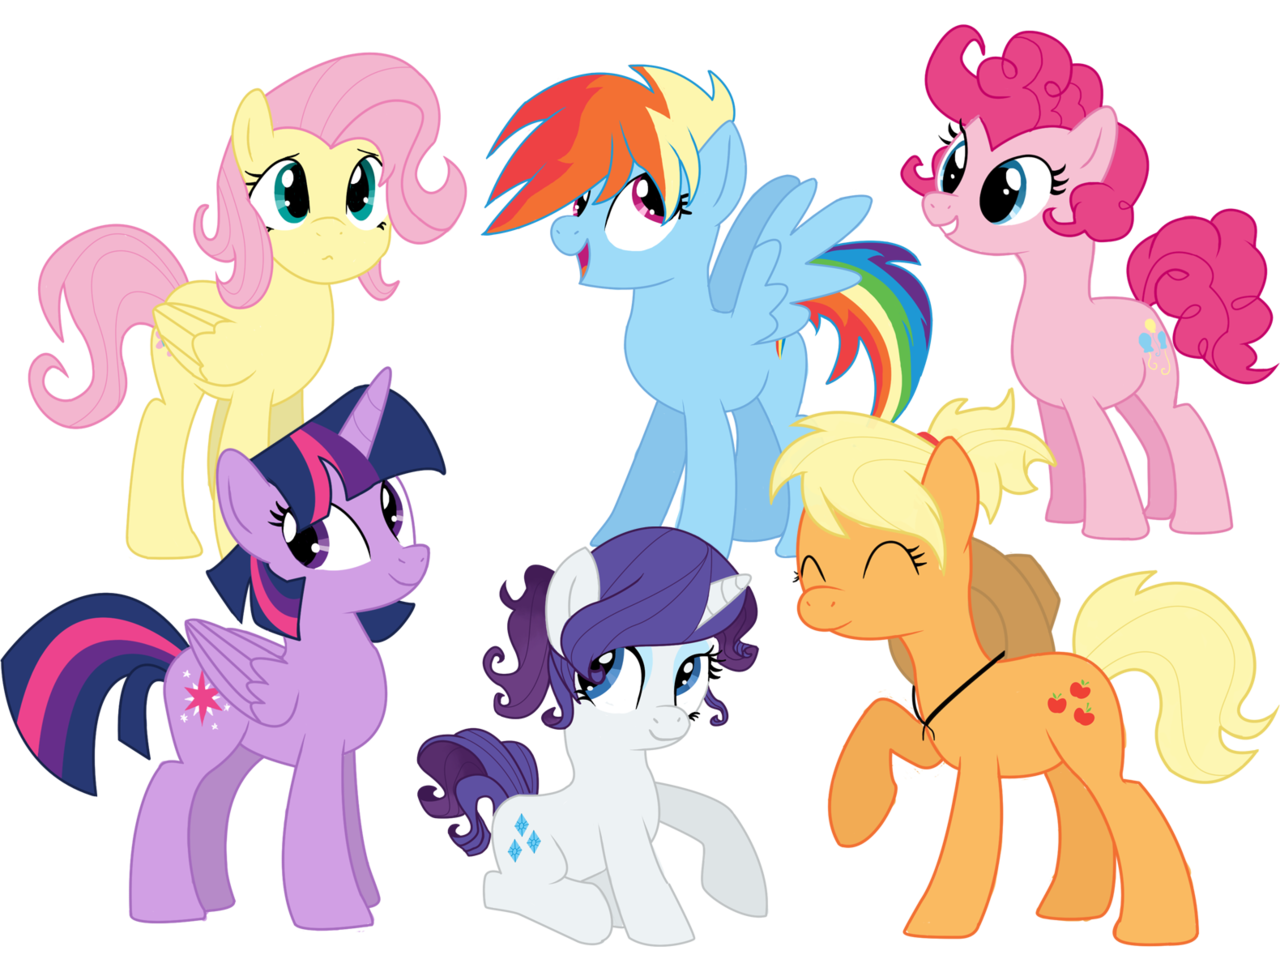 620072 Alicorn Alternate Hairstyle Applejack Artist My Little Pony Pictures Mlp My Little Pony Pony